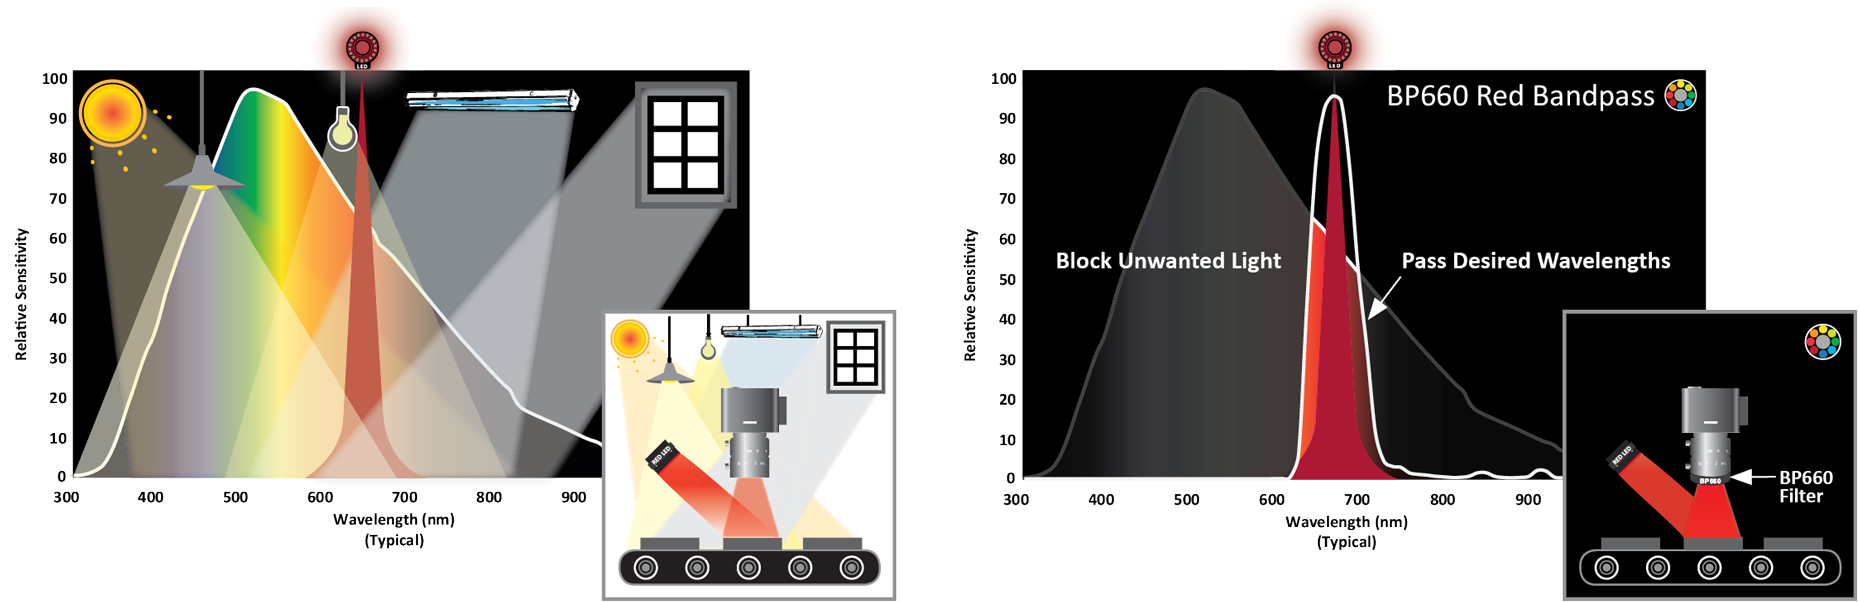 midopt_block_unwanted_light